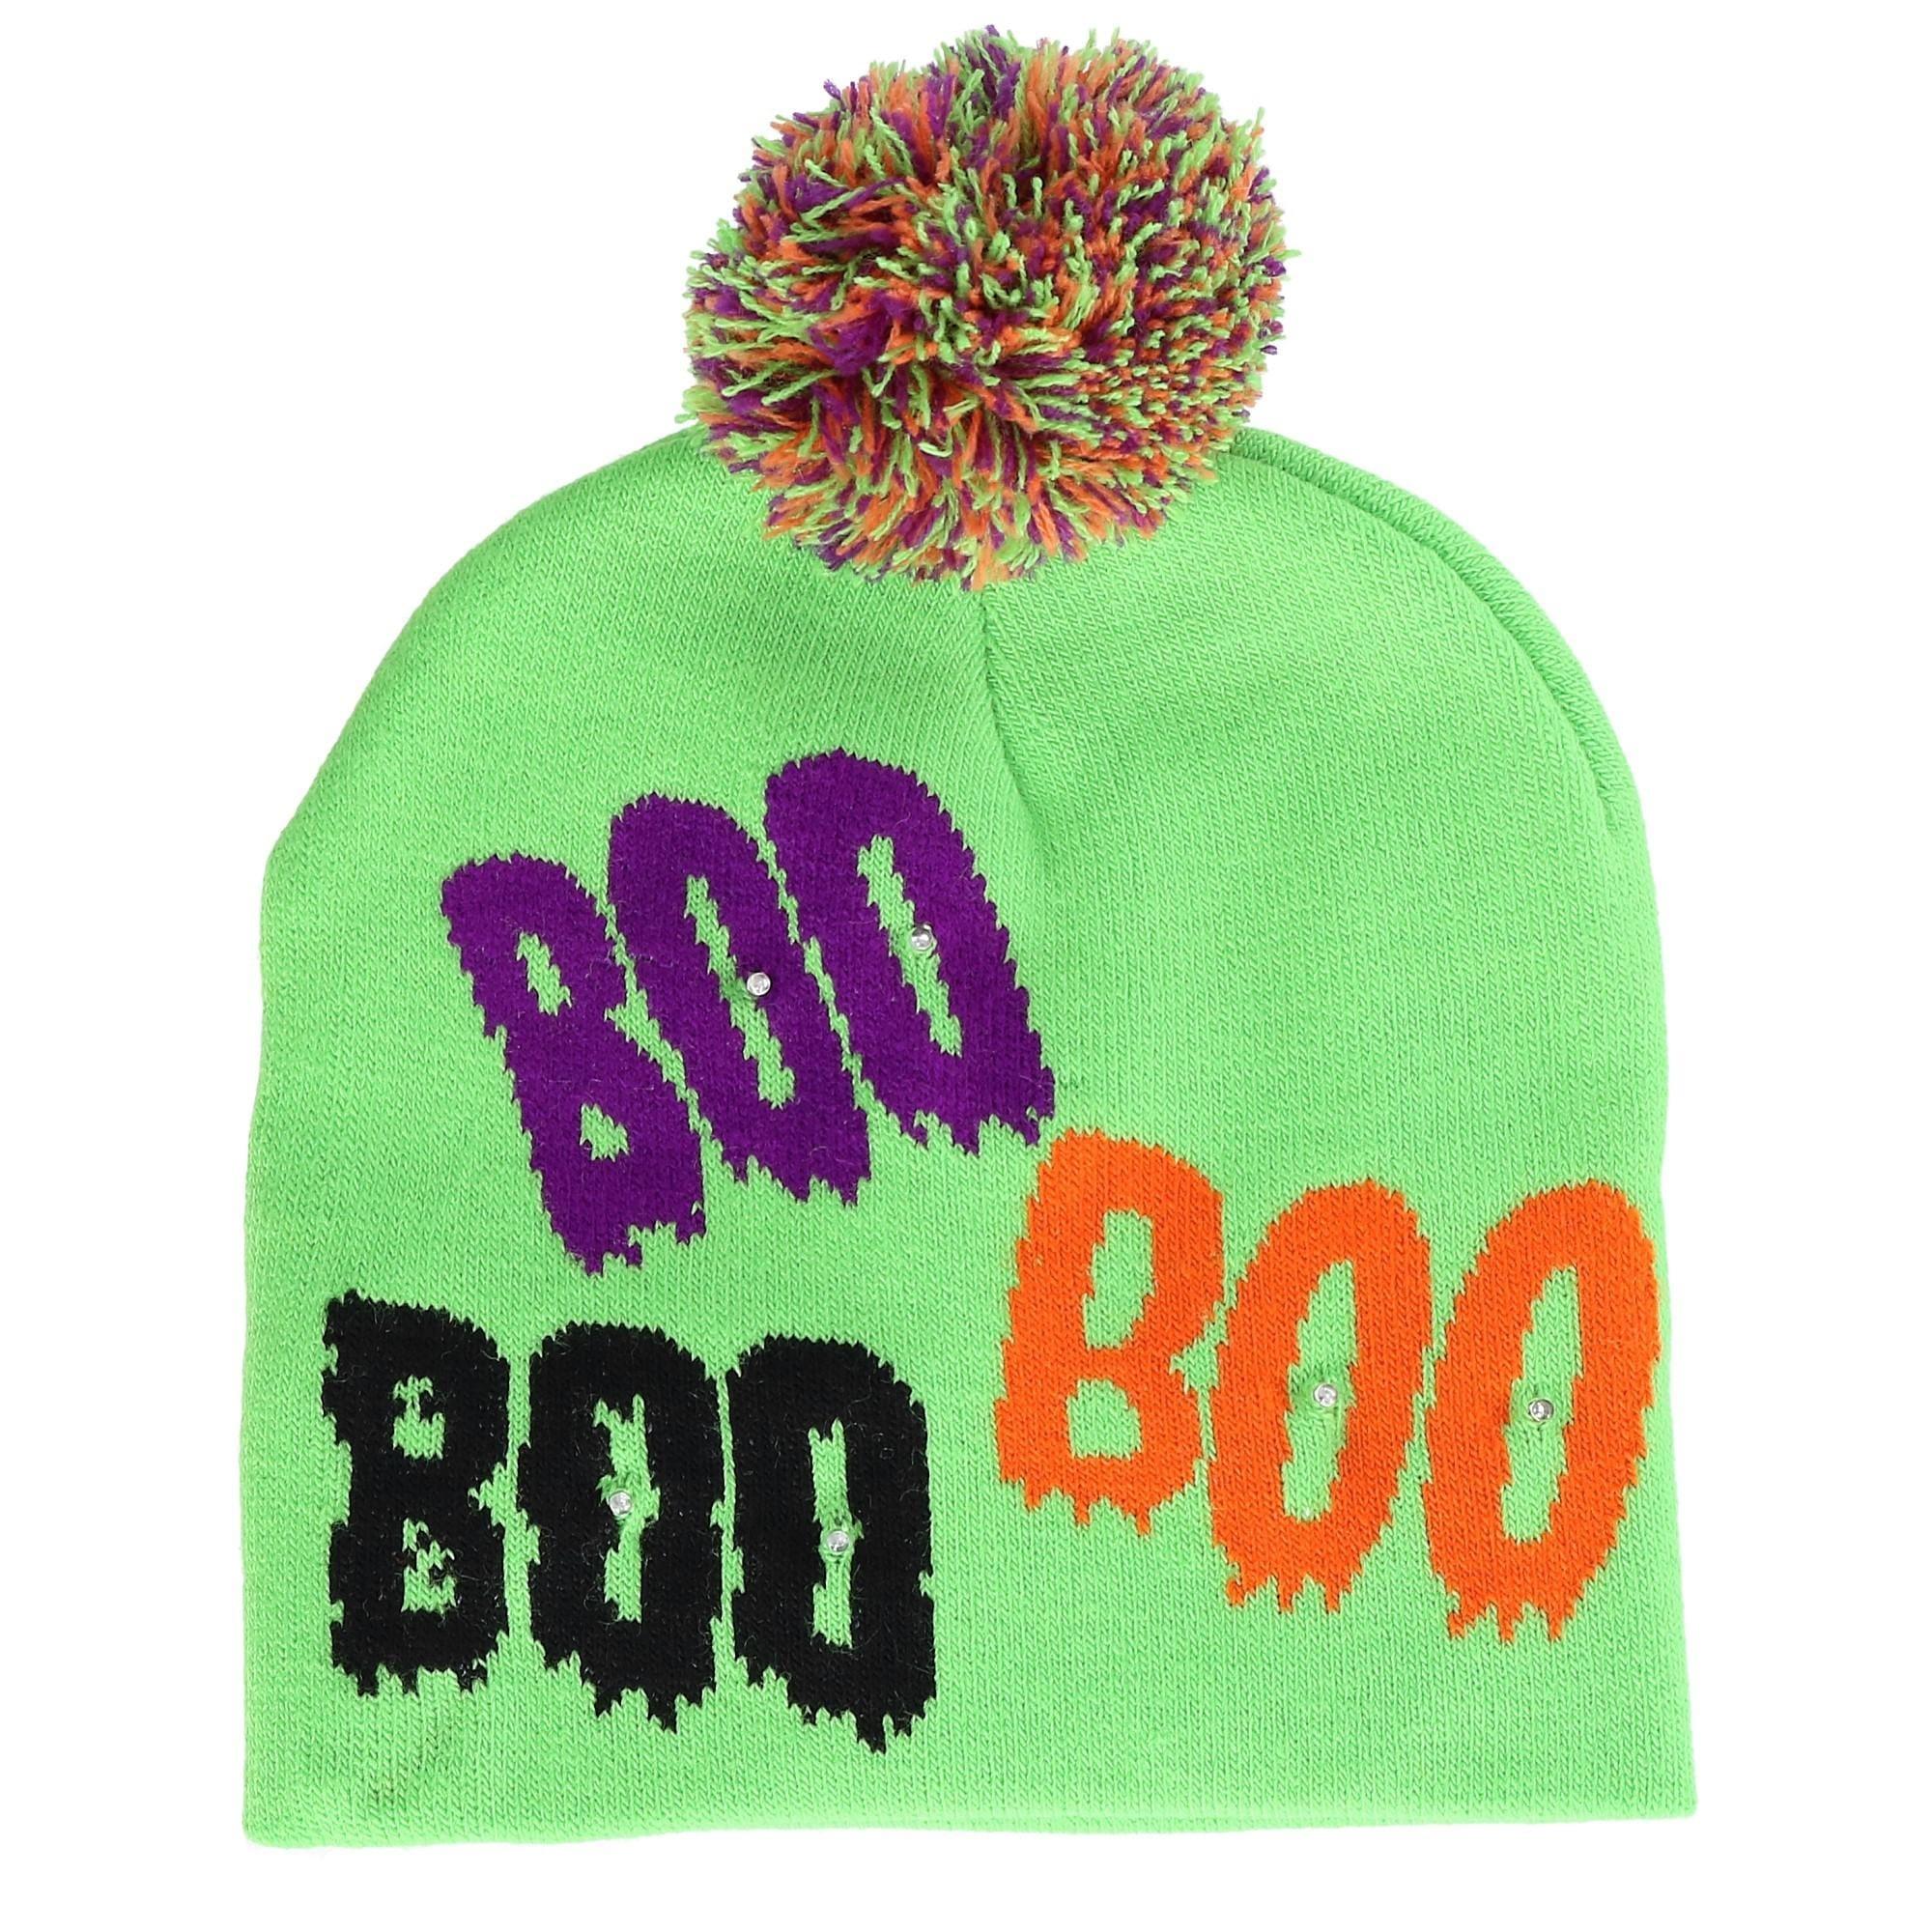 1728cec210542 Shop Lots a Lites Novelty Flashing Lights Halloween Beanie Hat ...